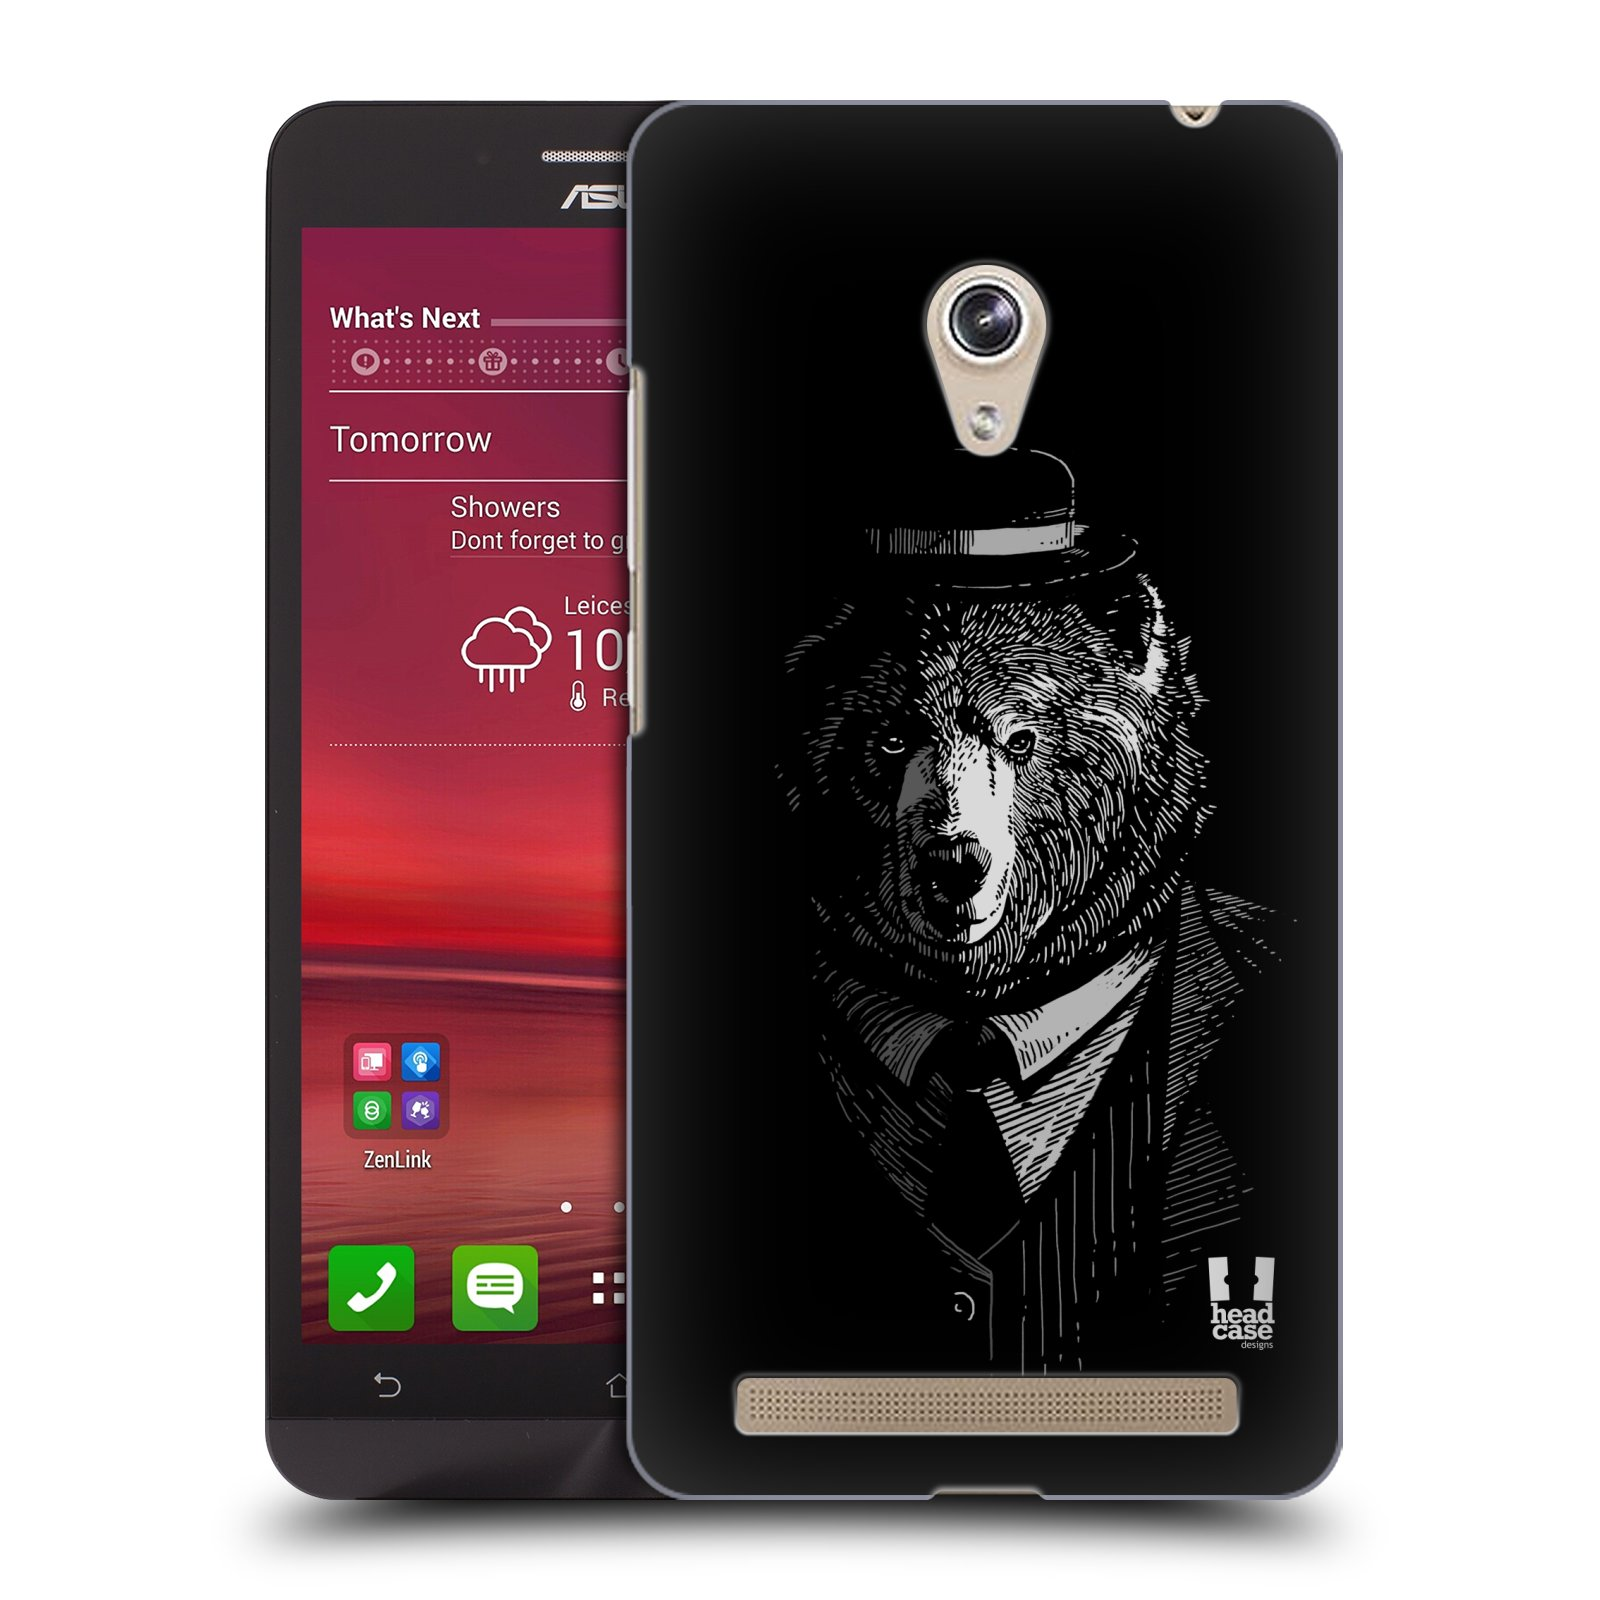 HEAD CASE plastový obal na mobil Asus Zenfone 6 vzor Zvíře v obleku medvěd